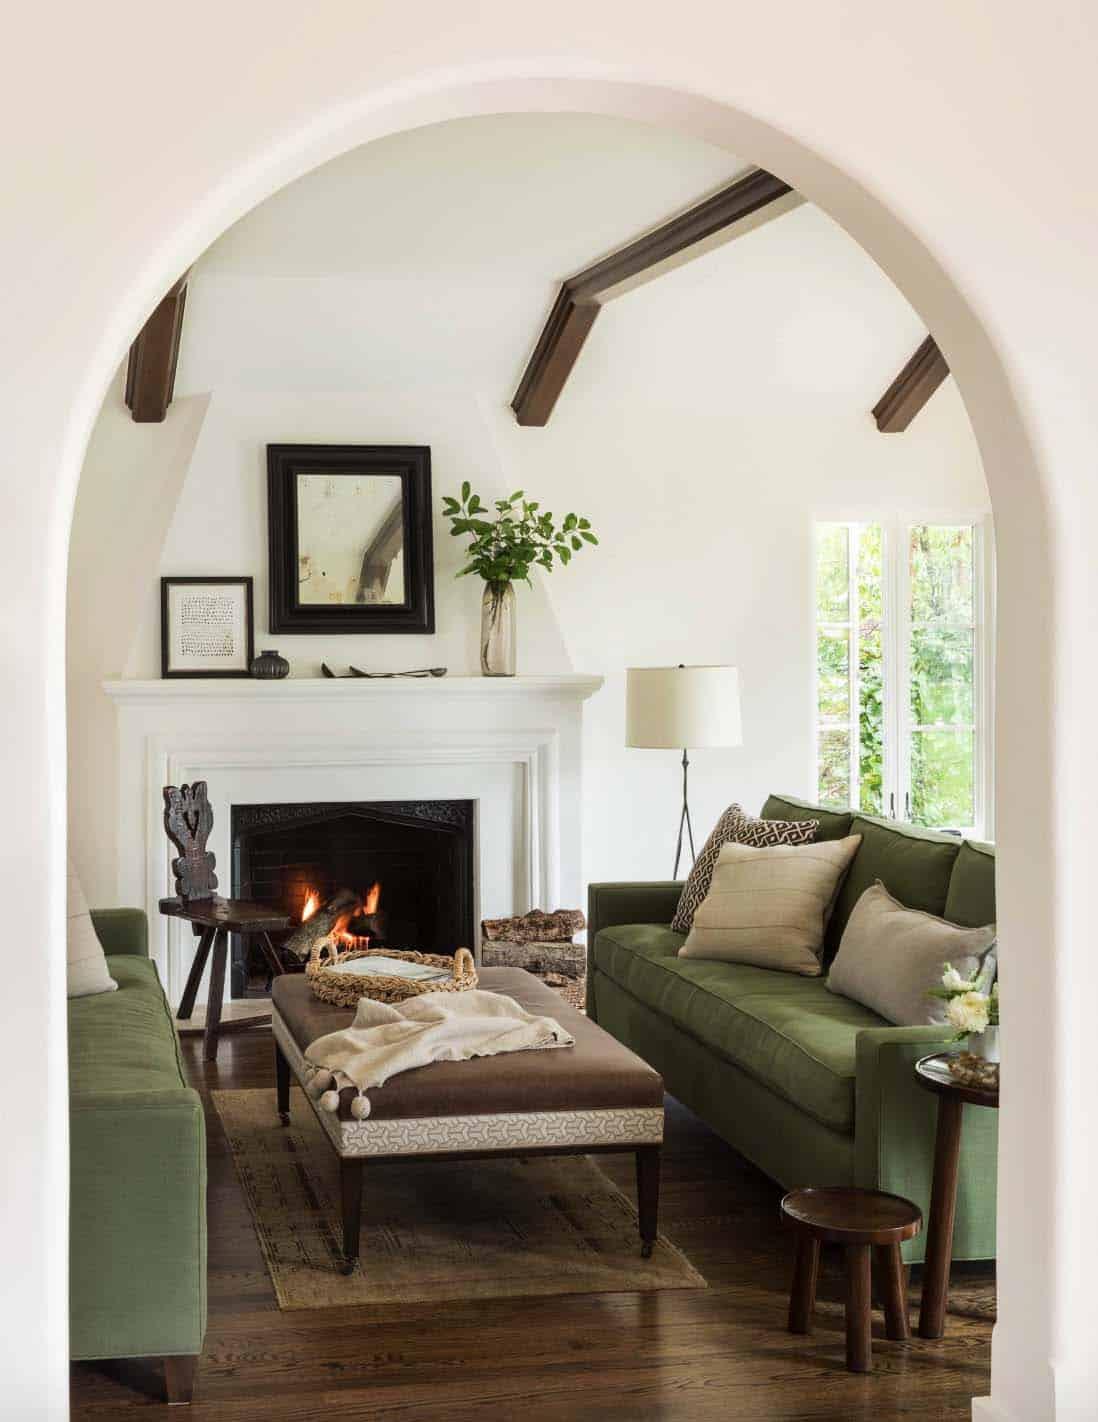 Mediterranean Style Home-Jute Interior Design-02-1 Kindesign